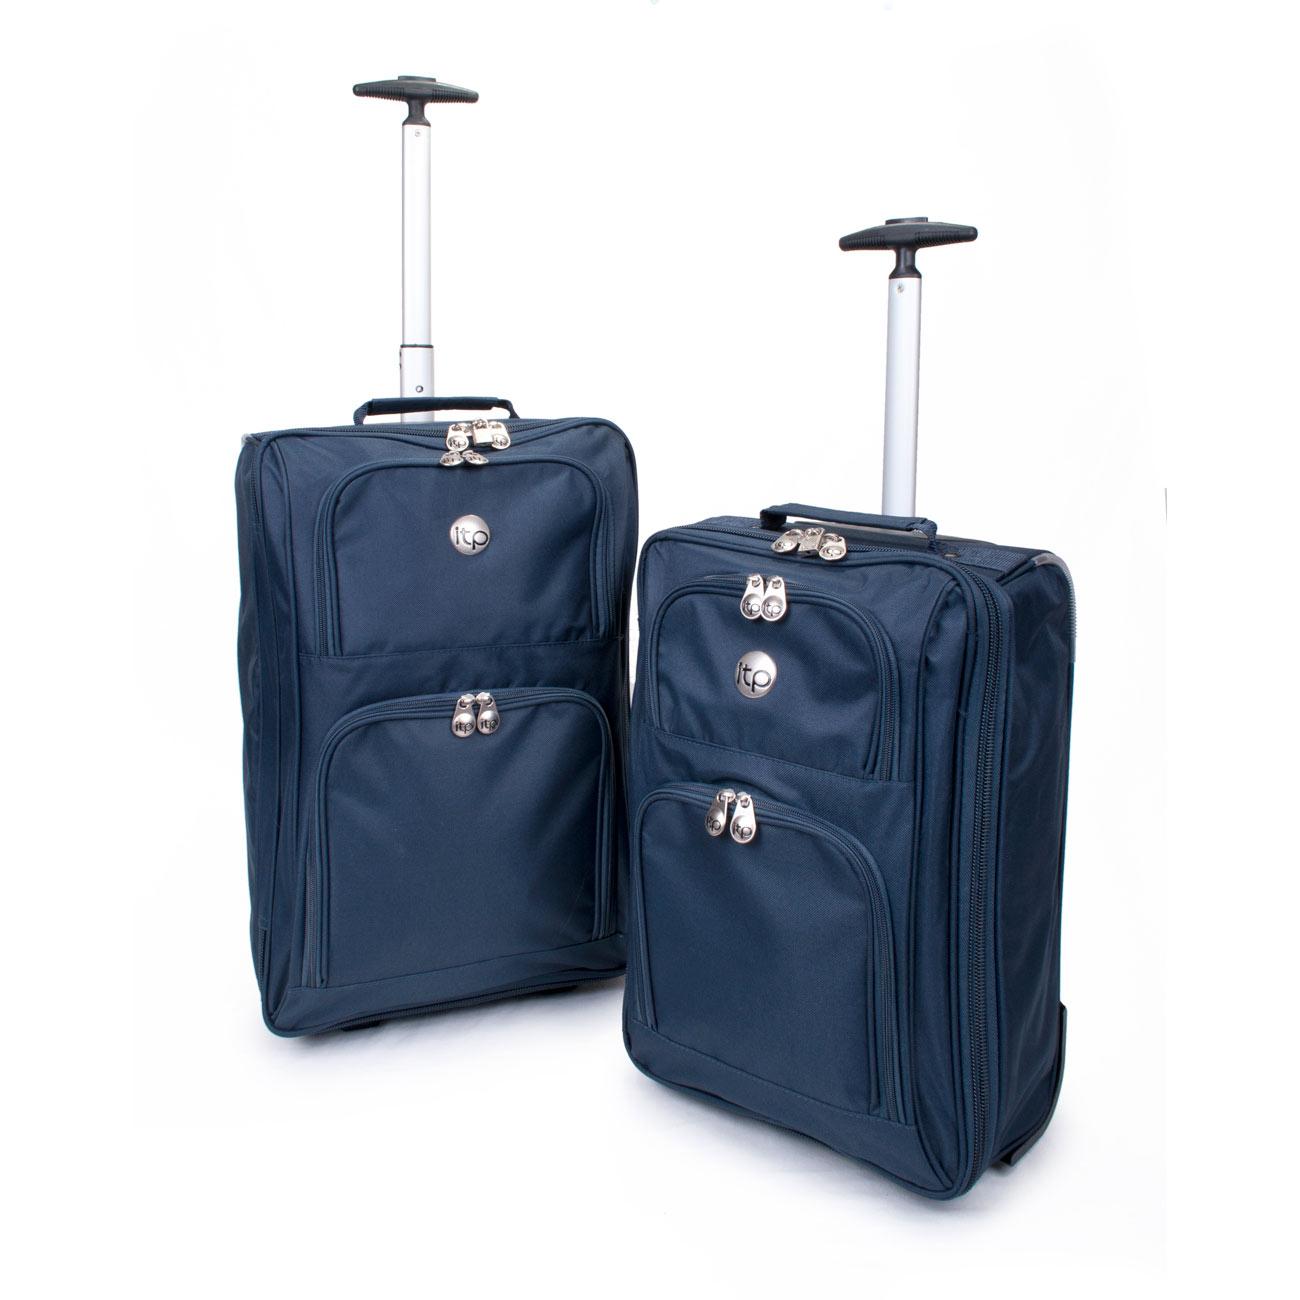 lightweight cabin hand luggage travel holdall wheeled trolley suitcase bag new ebay. Black Bedroom Furniture Sets. Home Design Ideas